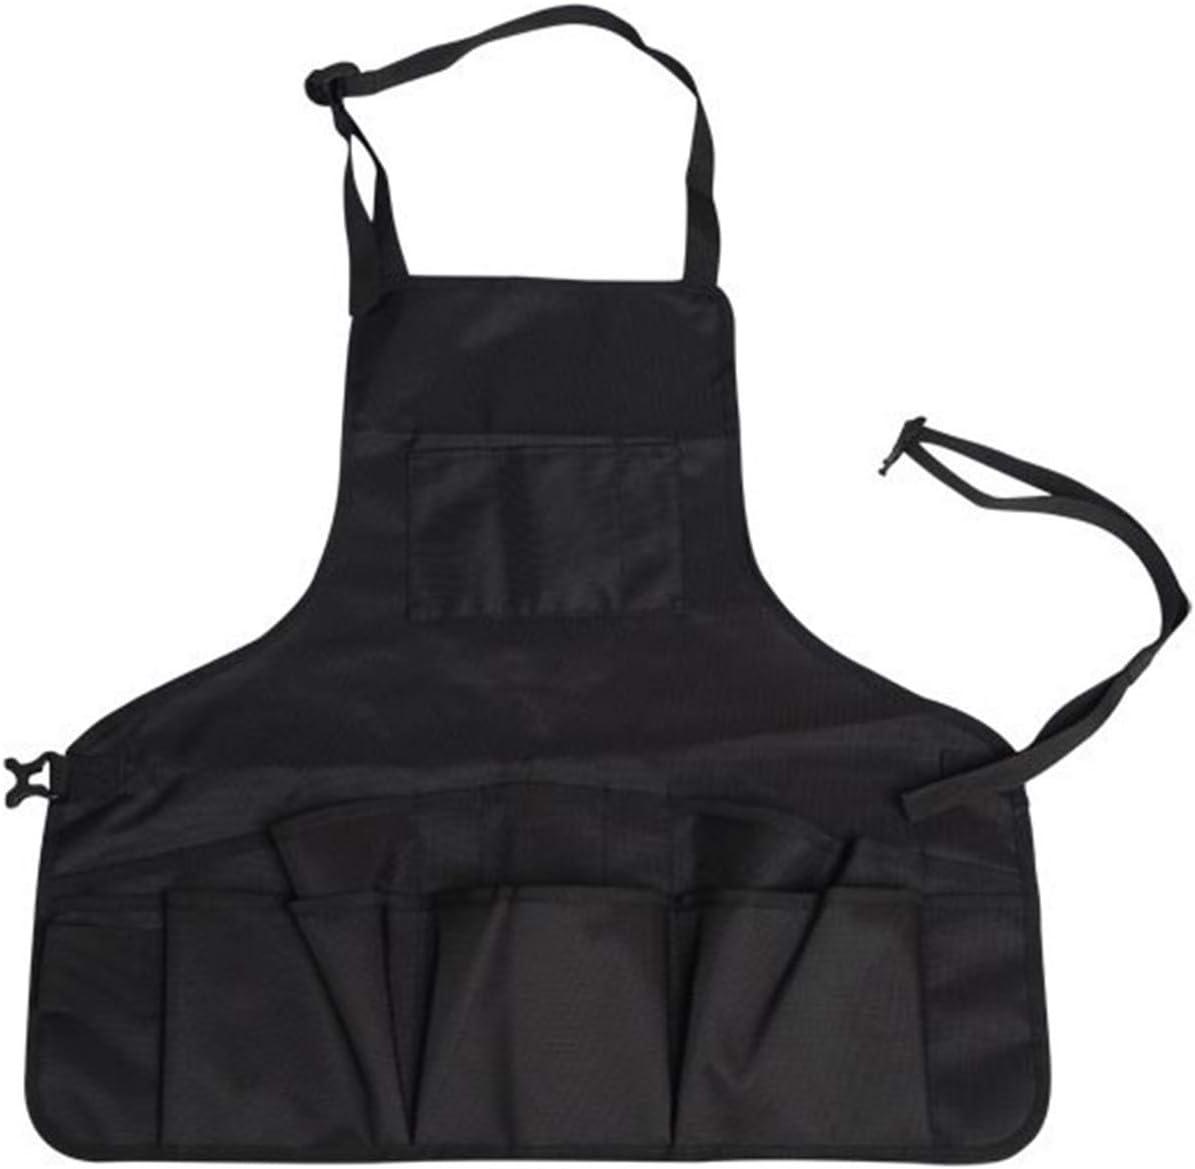 Tool Apron Multi-pocket Cleaning Housekeepi free Ranking TOP3 shipping Pocket Waiter Garden